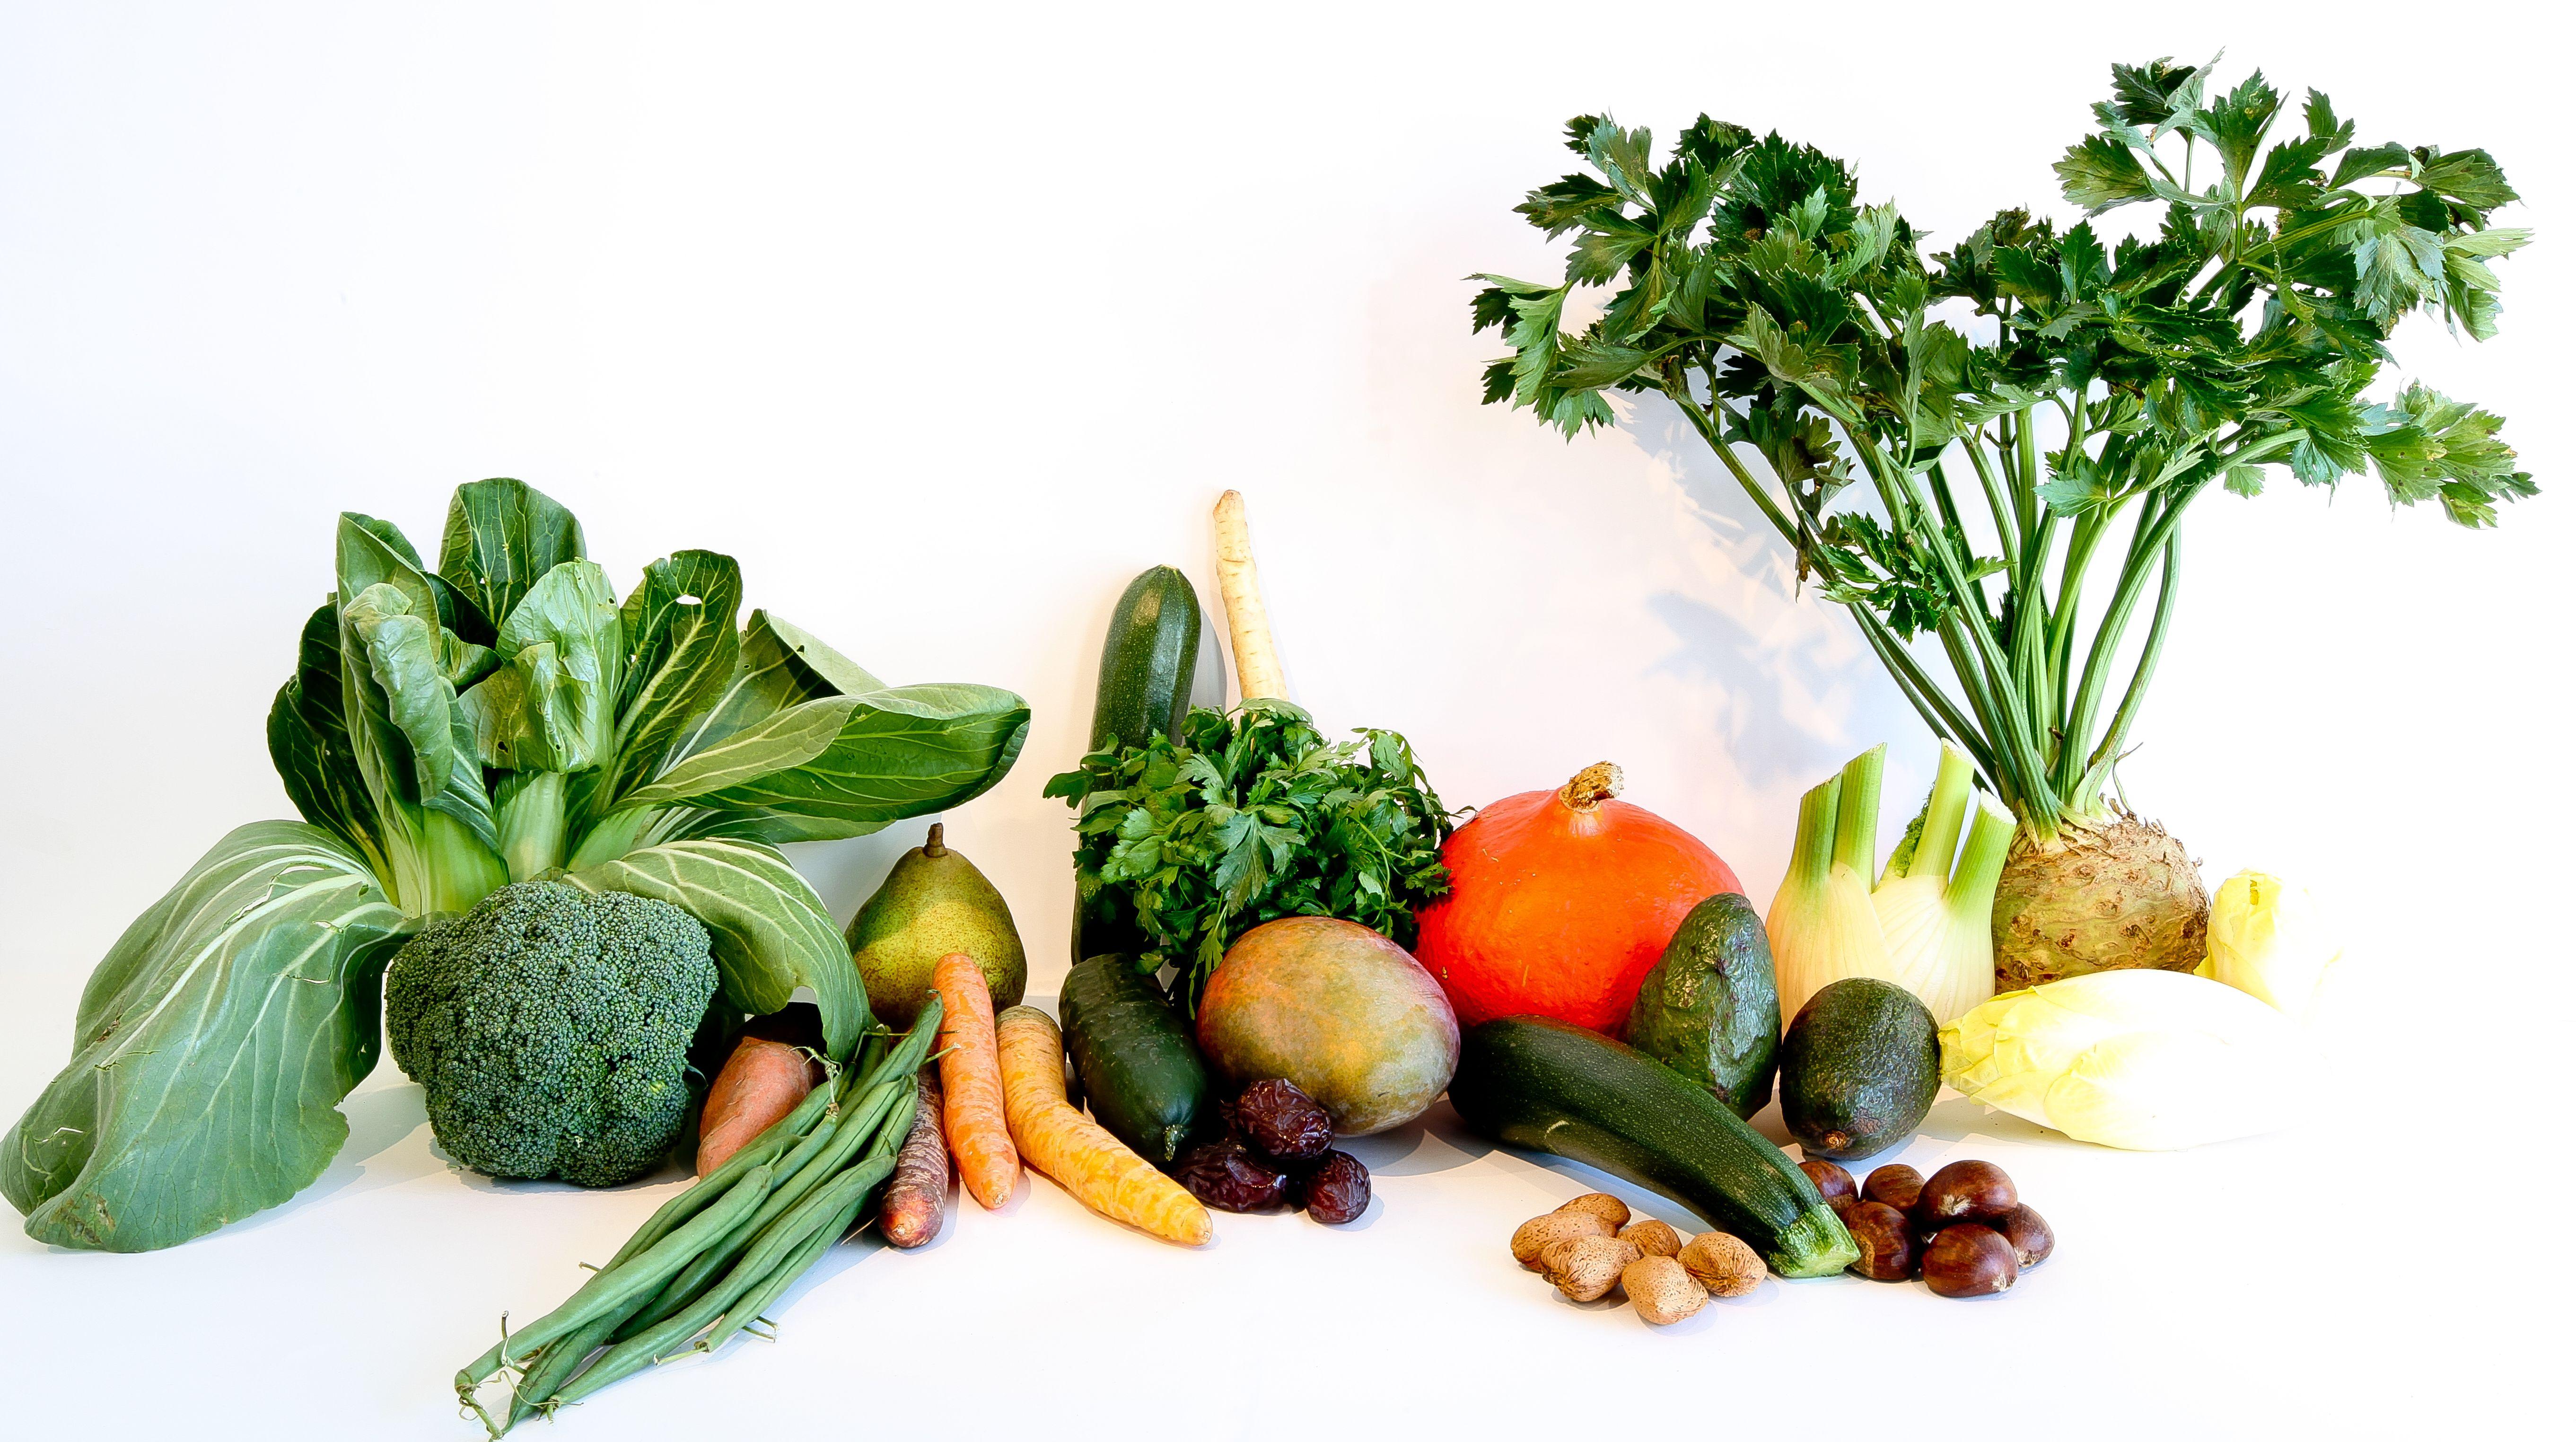 frutta-e-verdura (2)